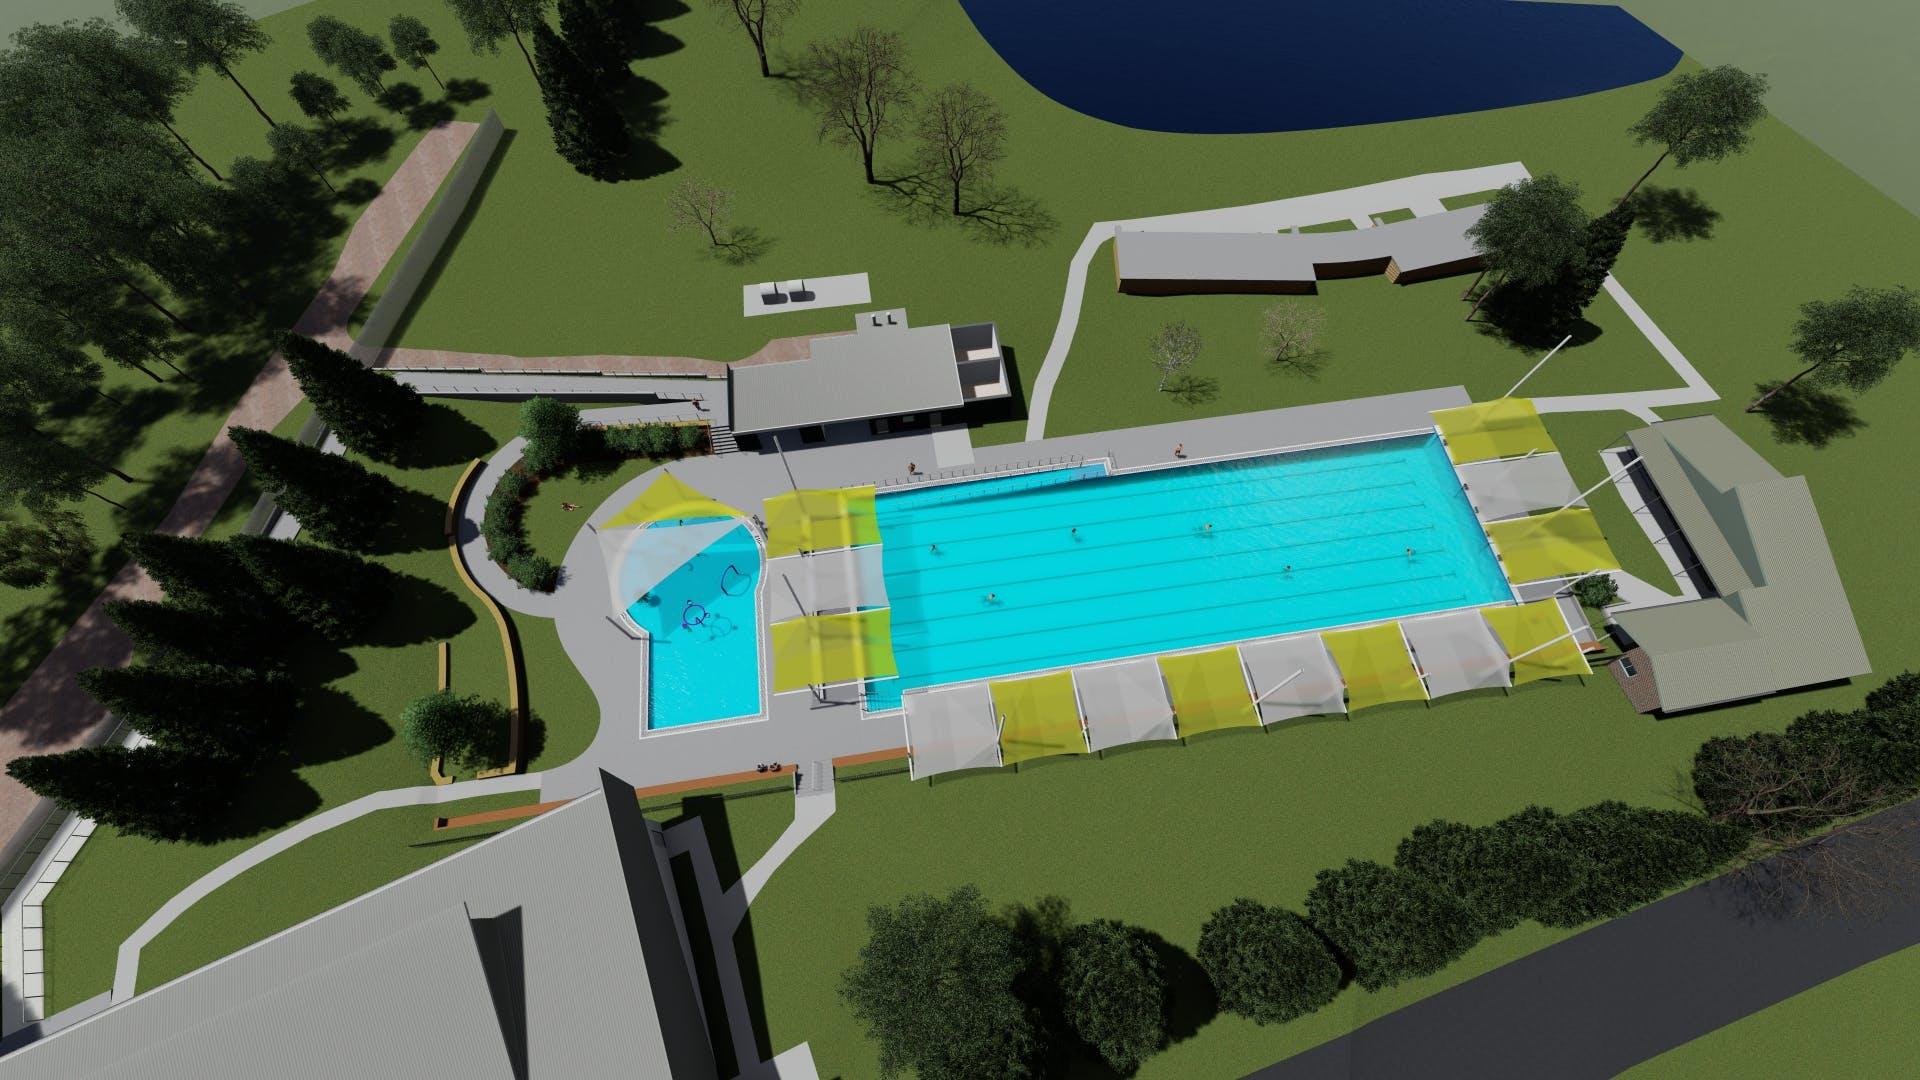 Aerial view of upgrade - concept design